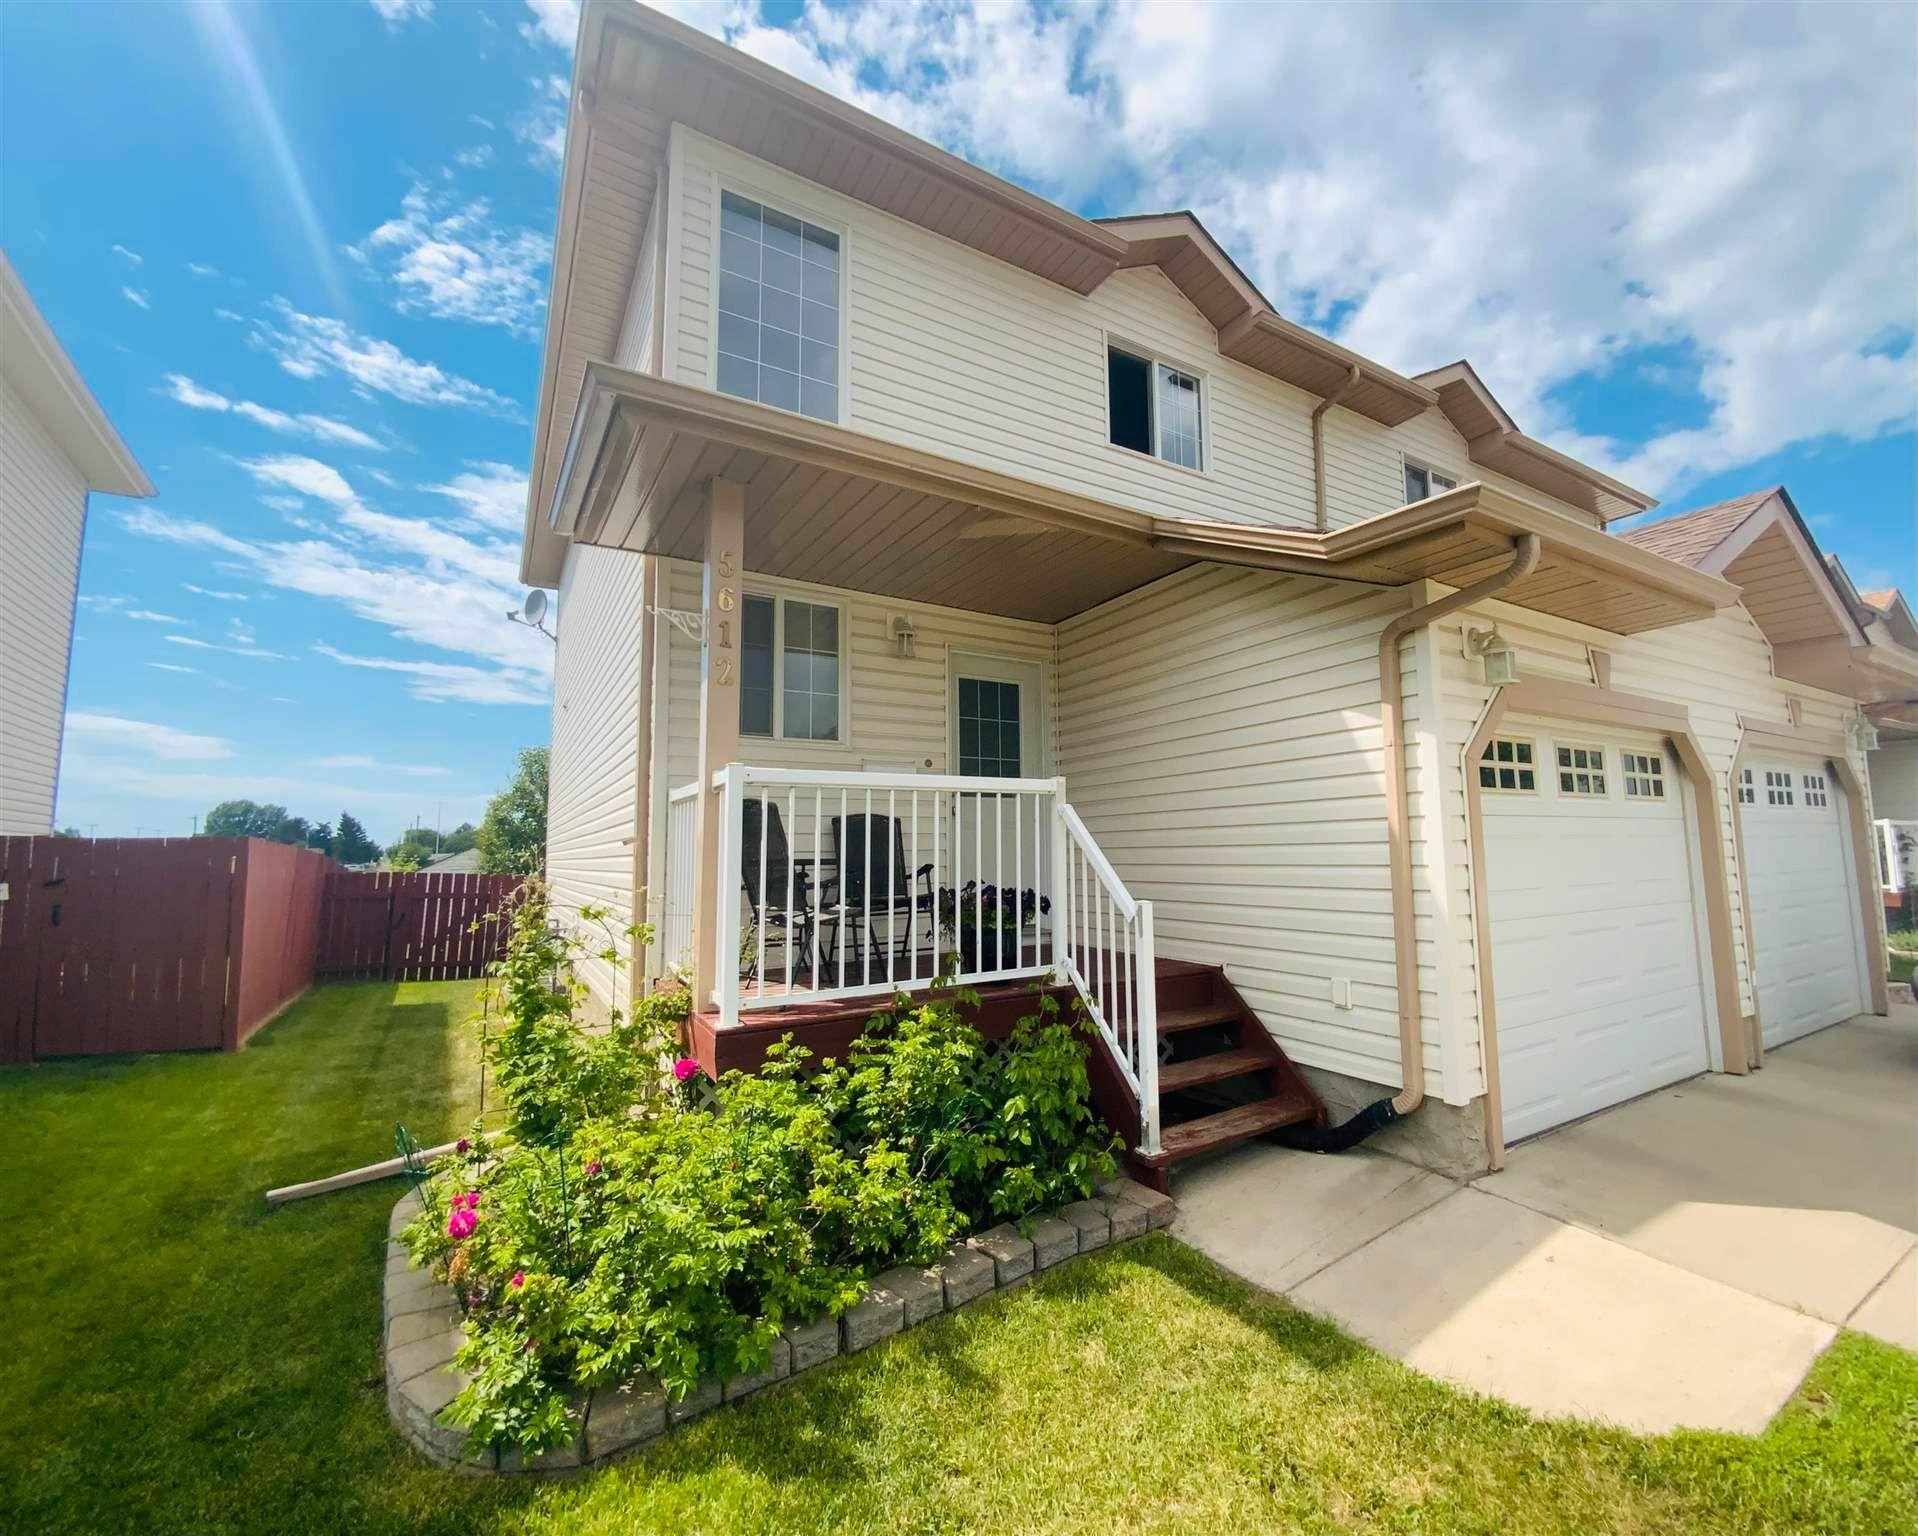 Main Photo: 5612 Garden Meadows Drive: Wetaskiwin House Half Duplex for sale : MLS®# E4251979